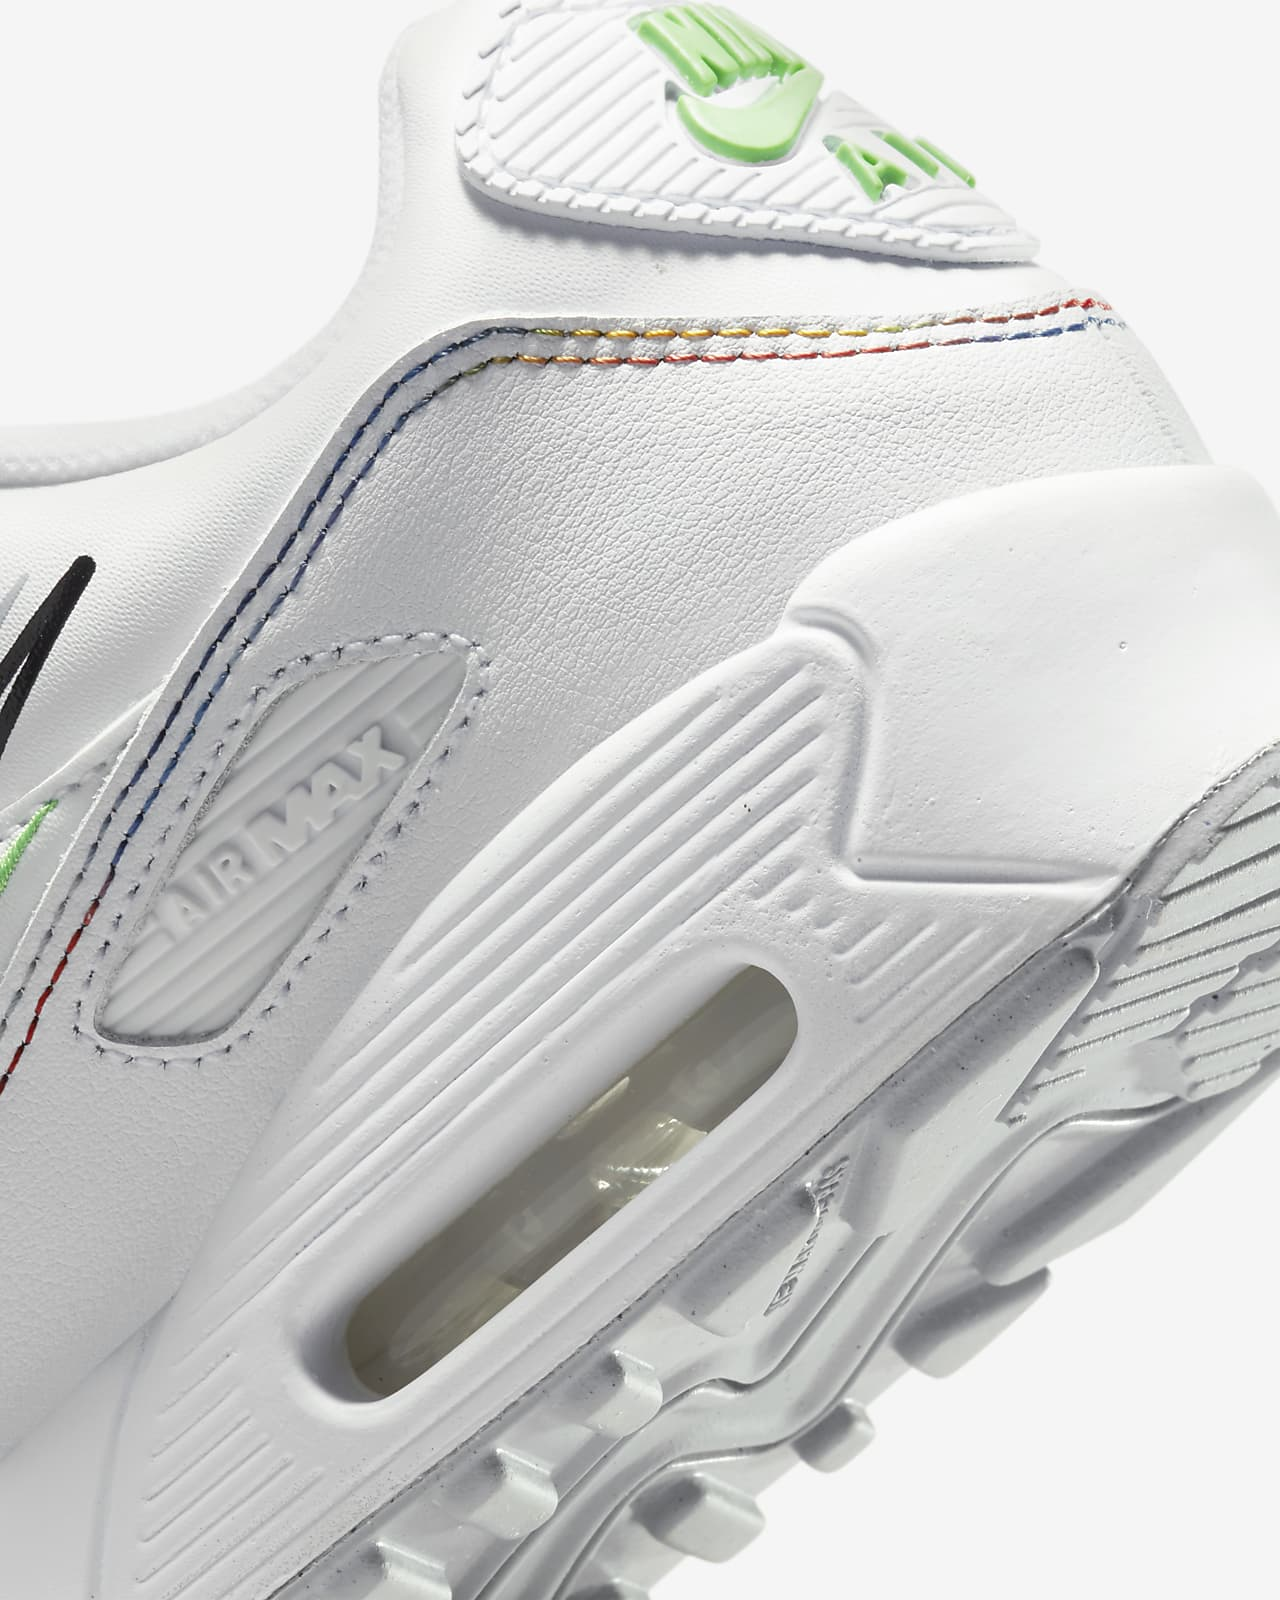 Chaussure Nike Air Max 90 pour Enfant plus âgé. Nike LU